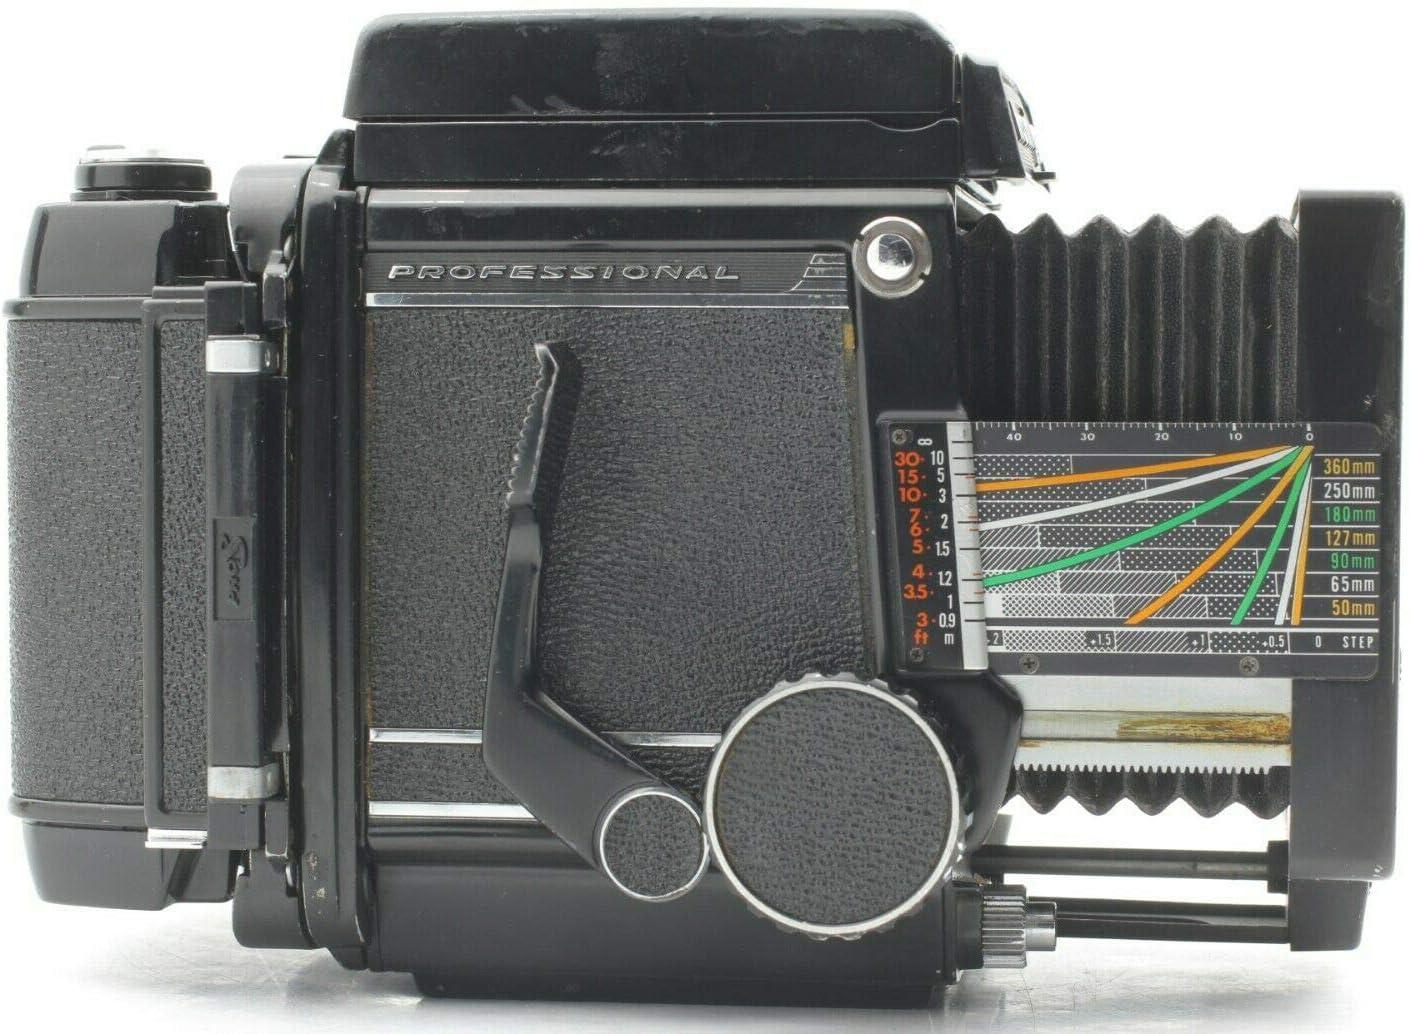 Electronics Mamiya RB-67 Pro SD Camera Body with Waist Level ...